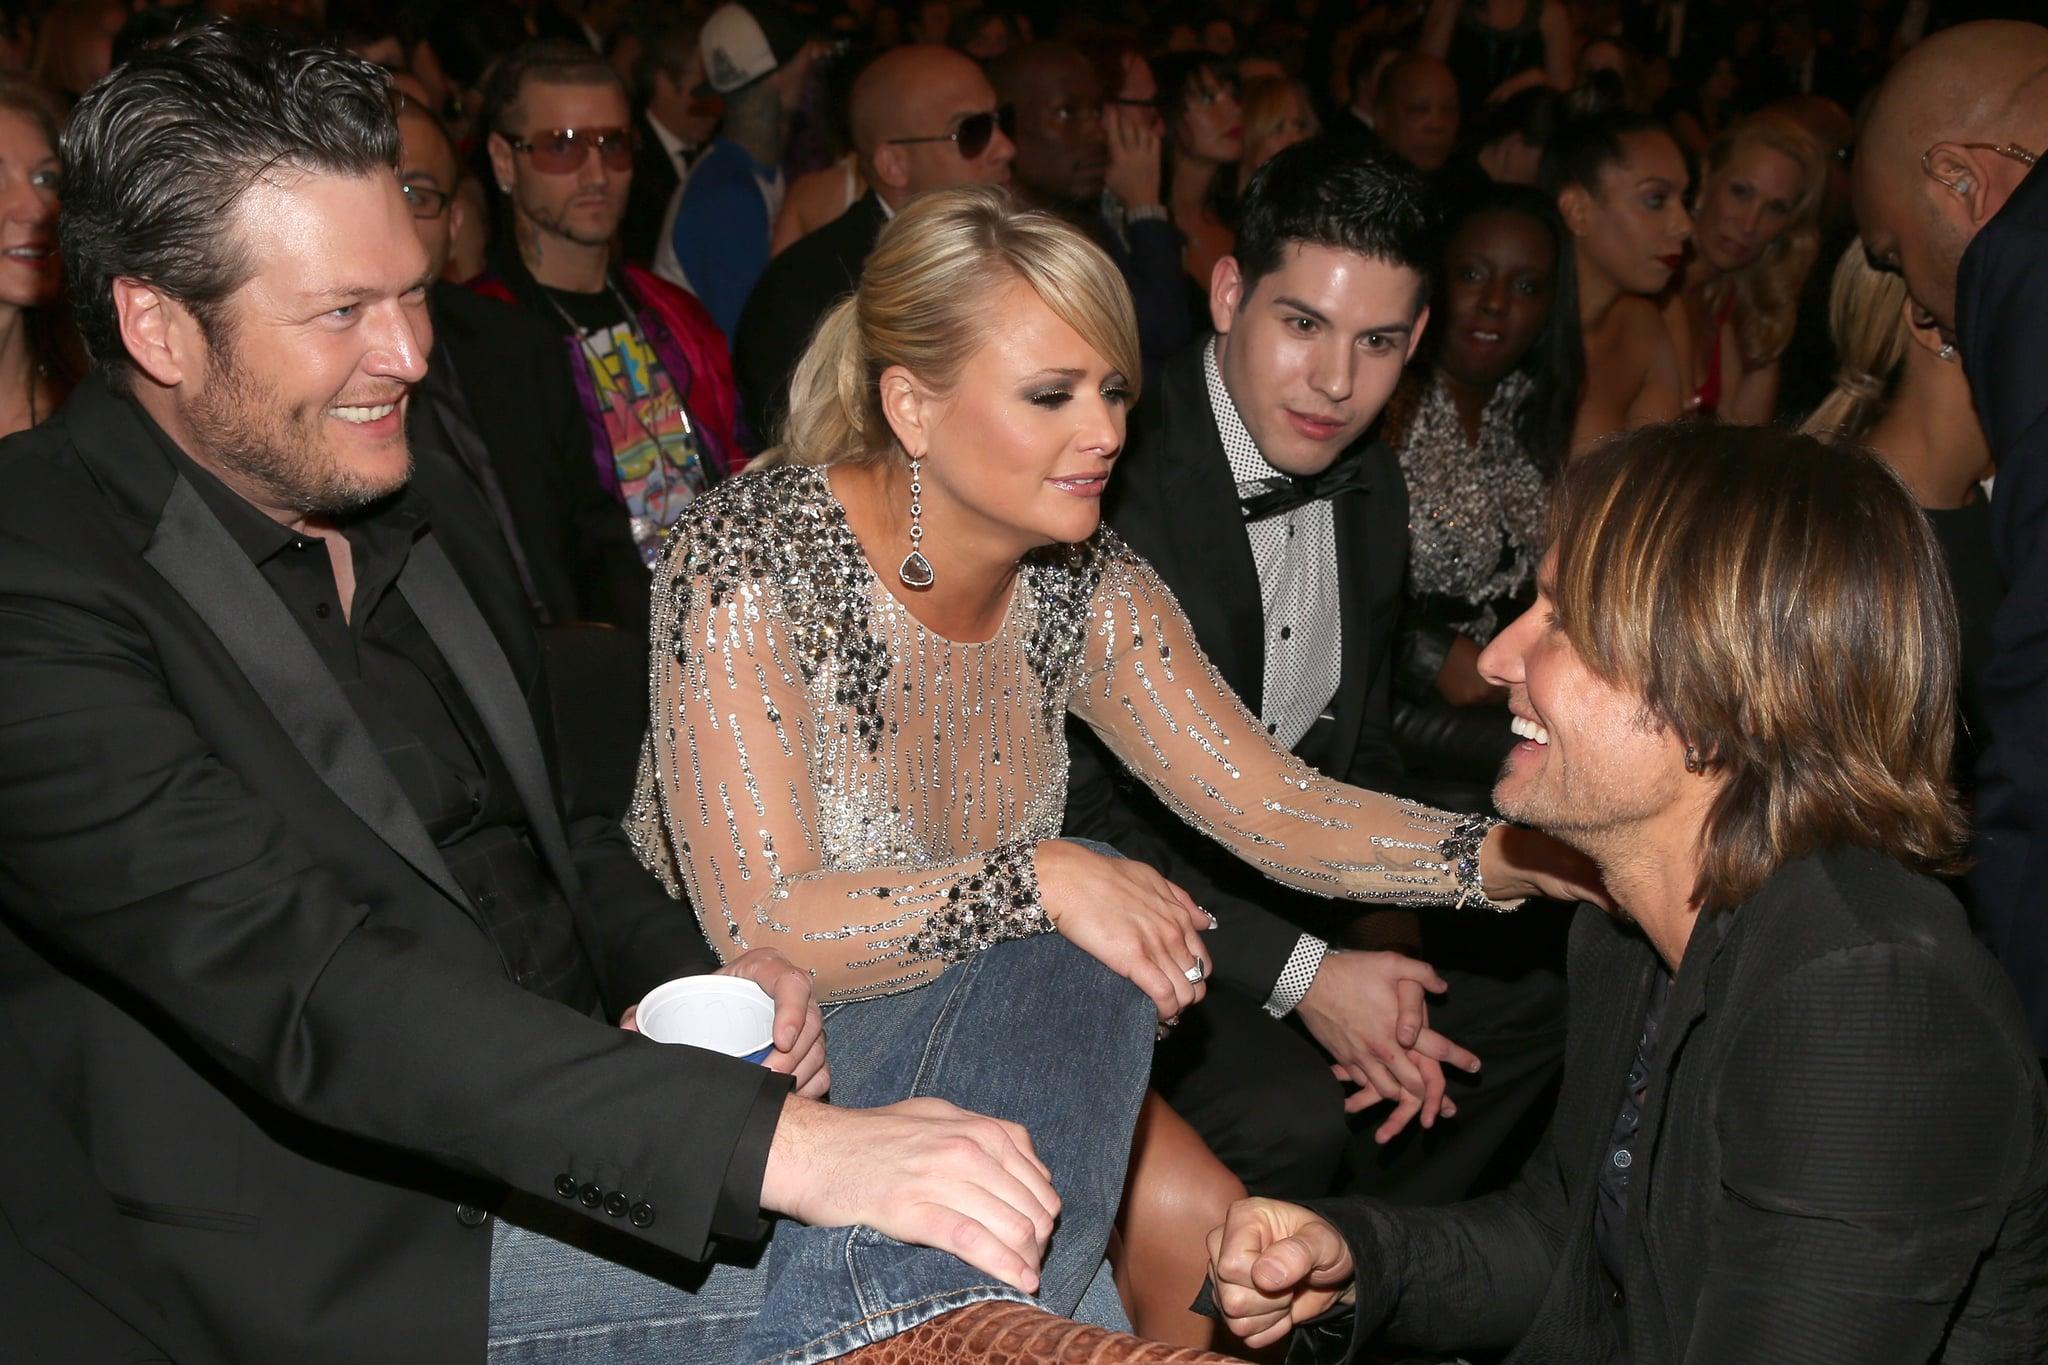 Blake Shelton, Miranda Lambert, and Keith Urban had a country music reunion inside the Grammy Awards on Sunday night.